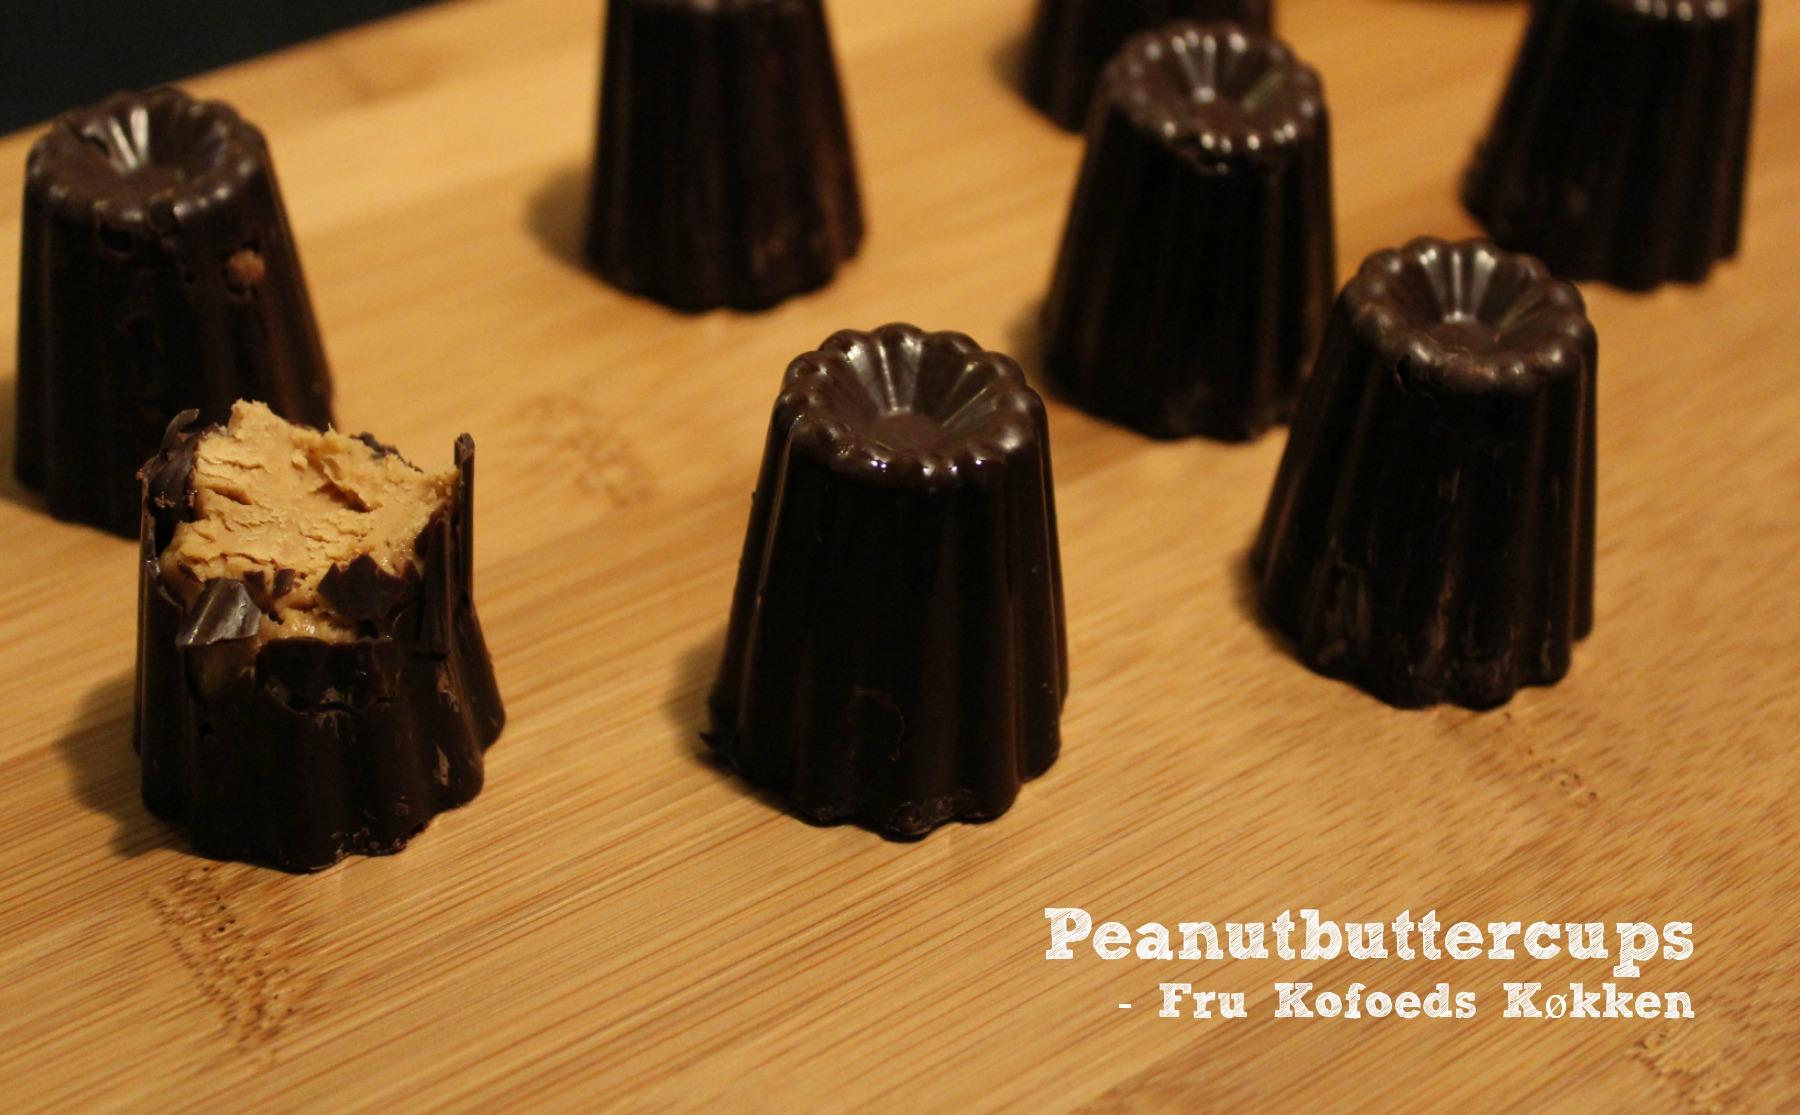 Hjemmelavede peanutbuttercups